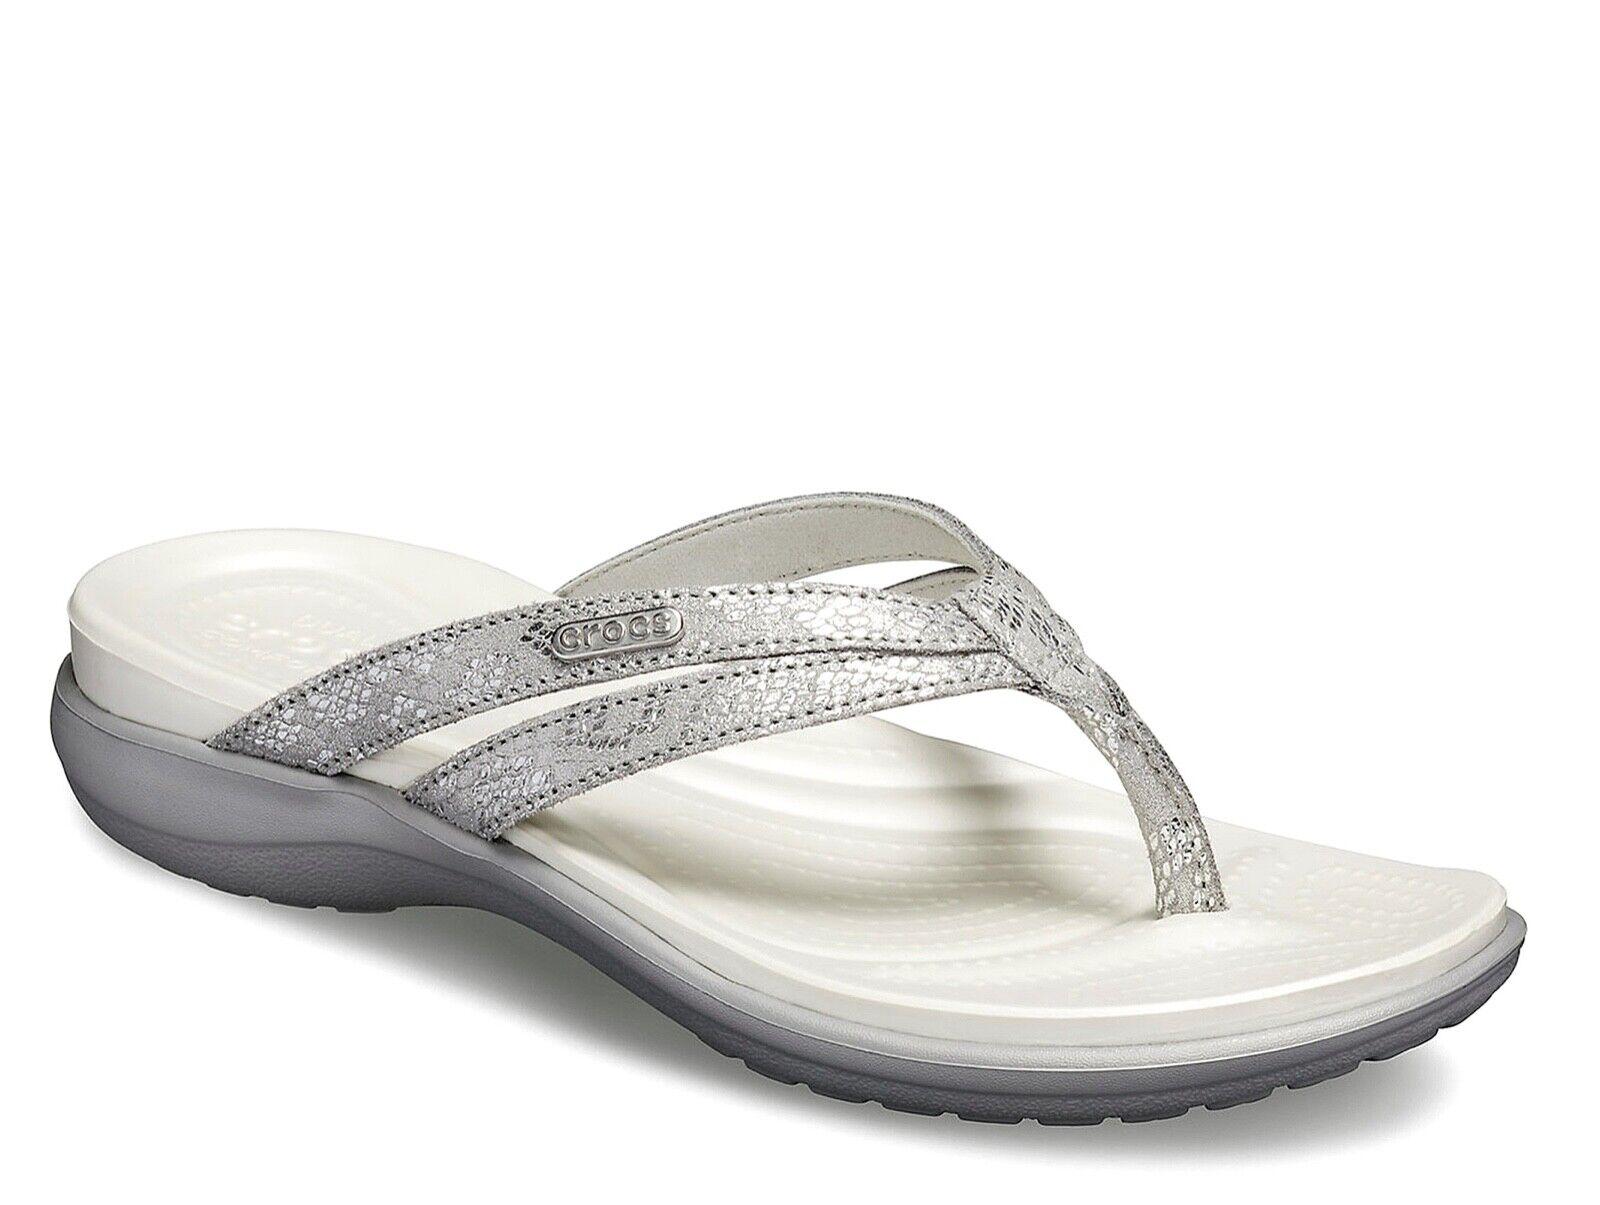 Crocs NEW Capri Silber damen strappy comfort sandals flip flops UK Größe 3-9